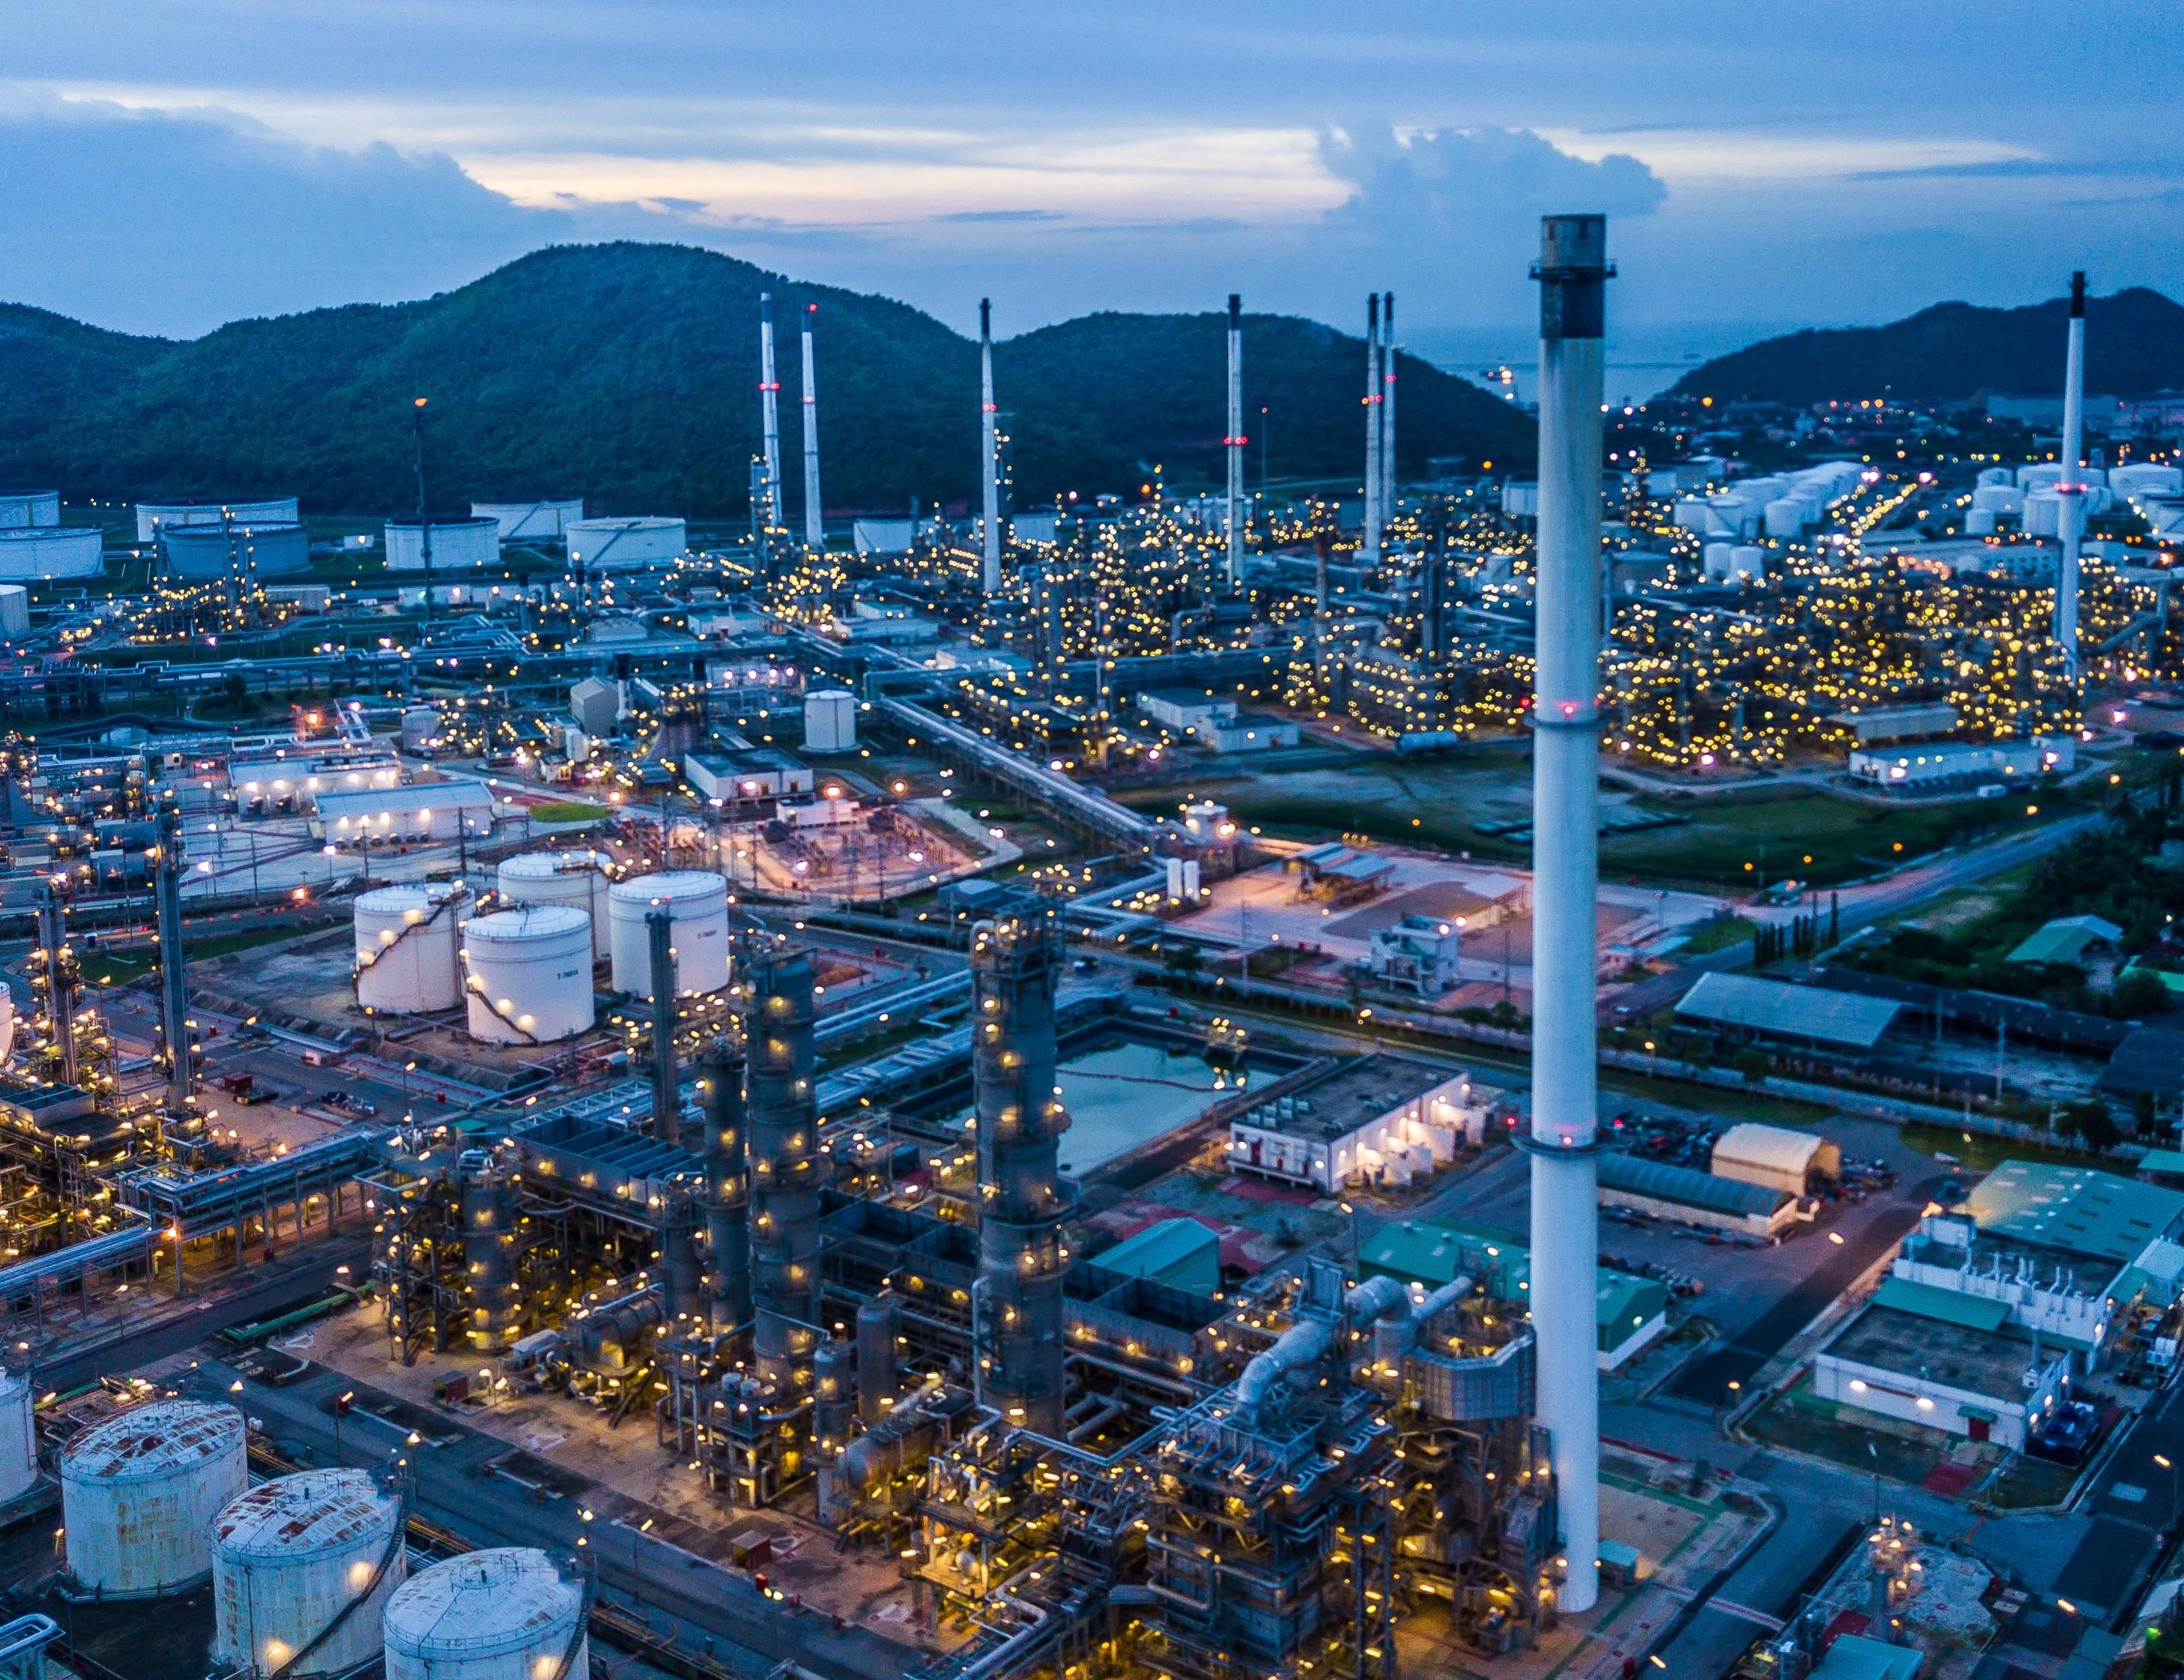 Germans chemicals are confident but cautious